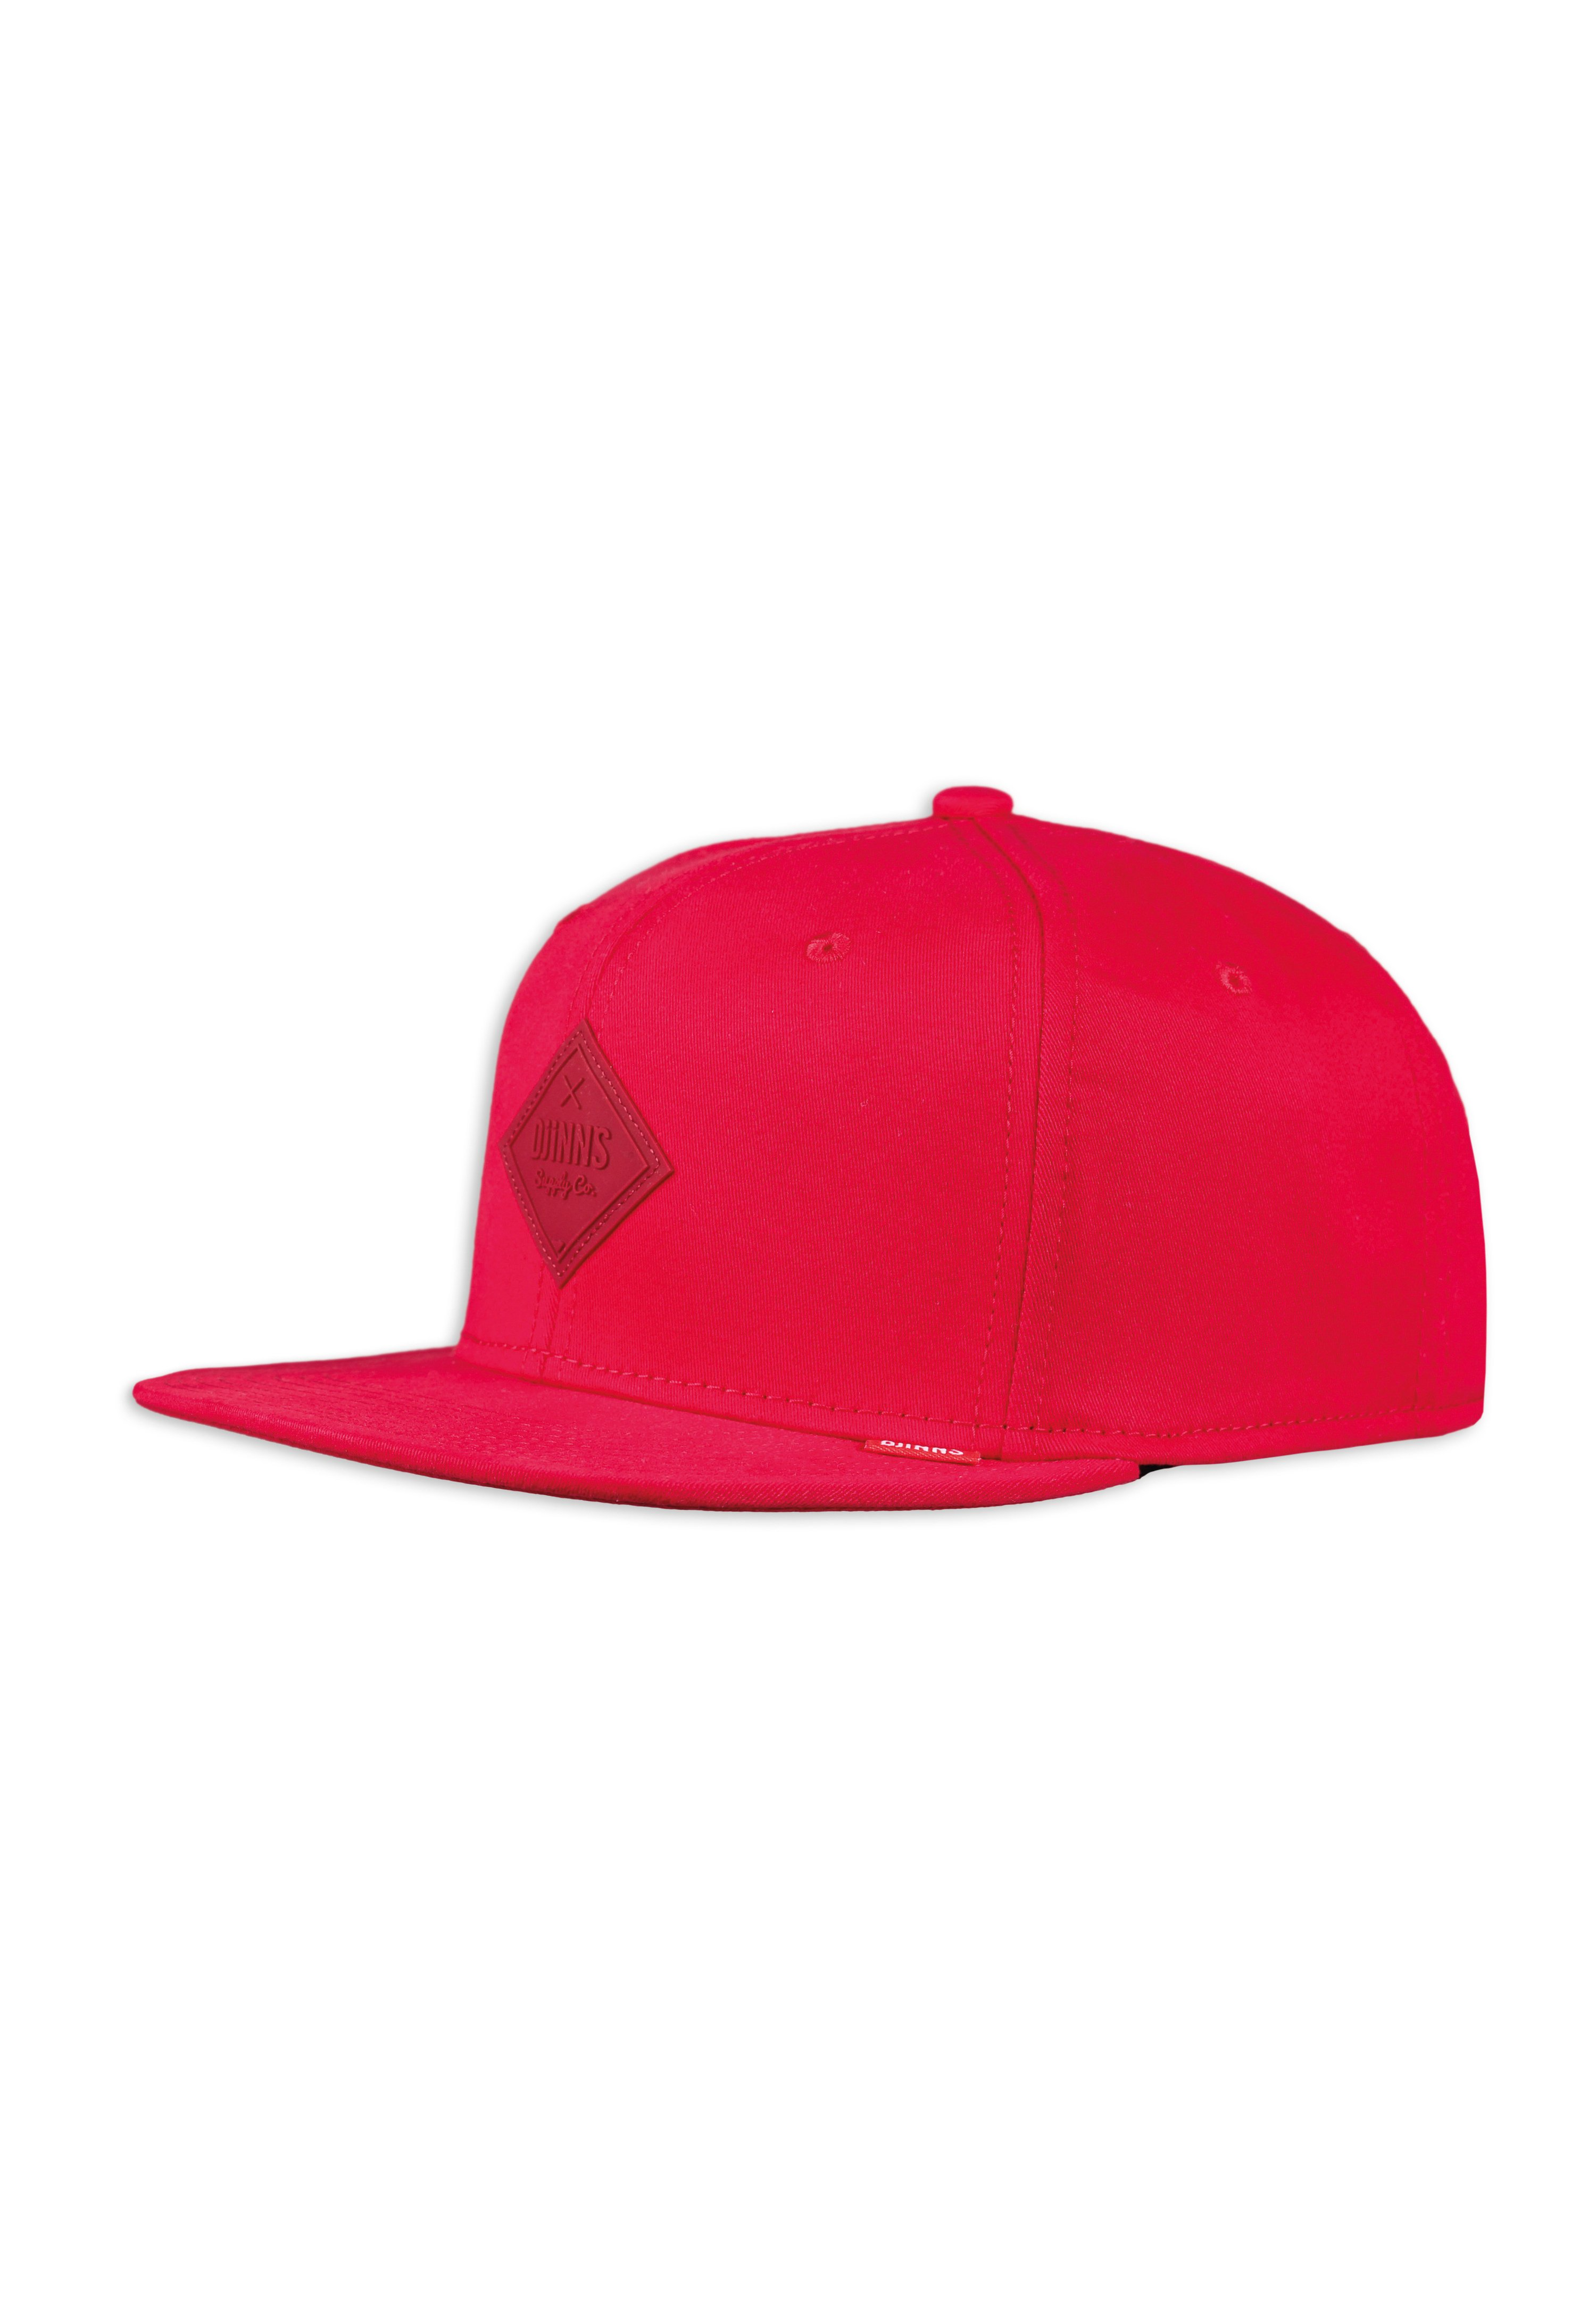 Uomo FLEX BASICBEAUTY - Cappellino